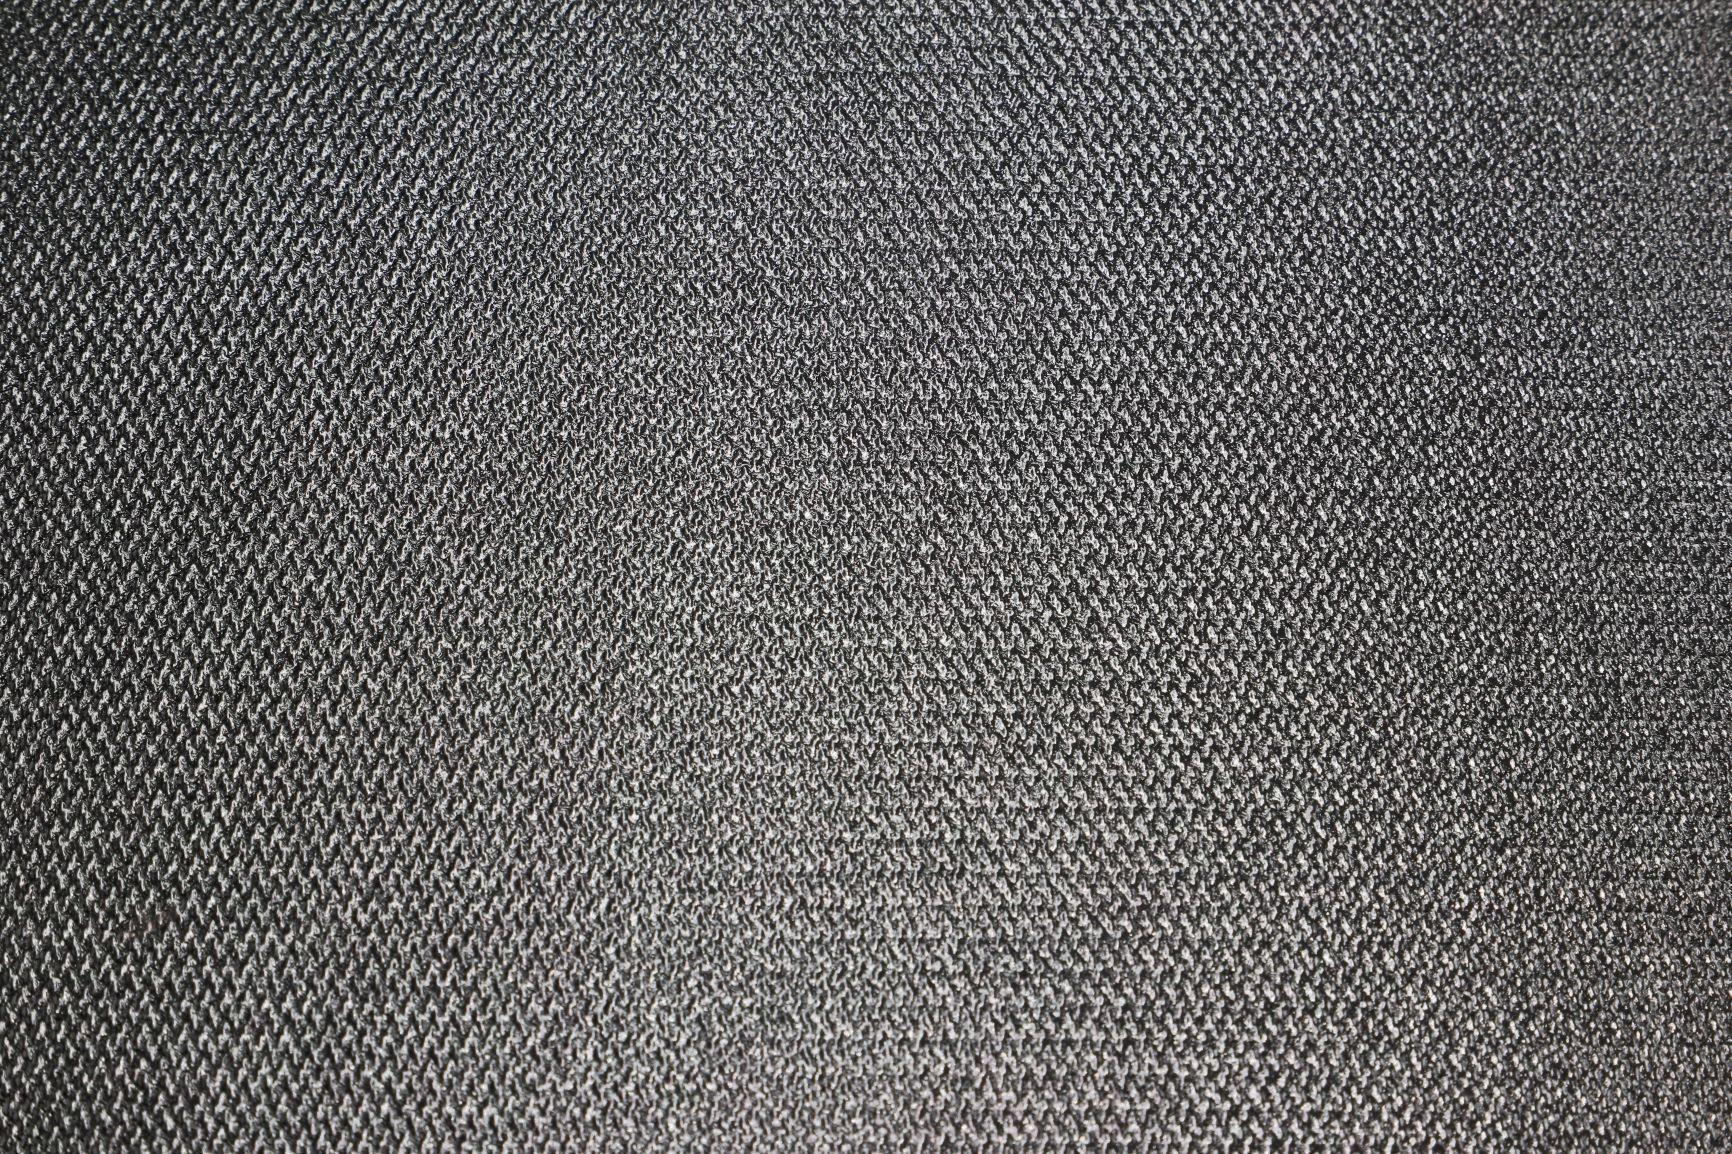 Fireproof aluminized aramid fabric for protection clothing